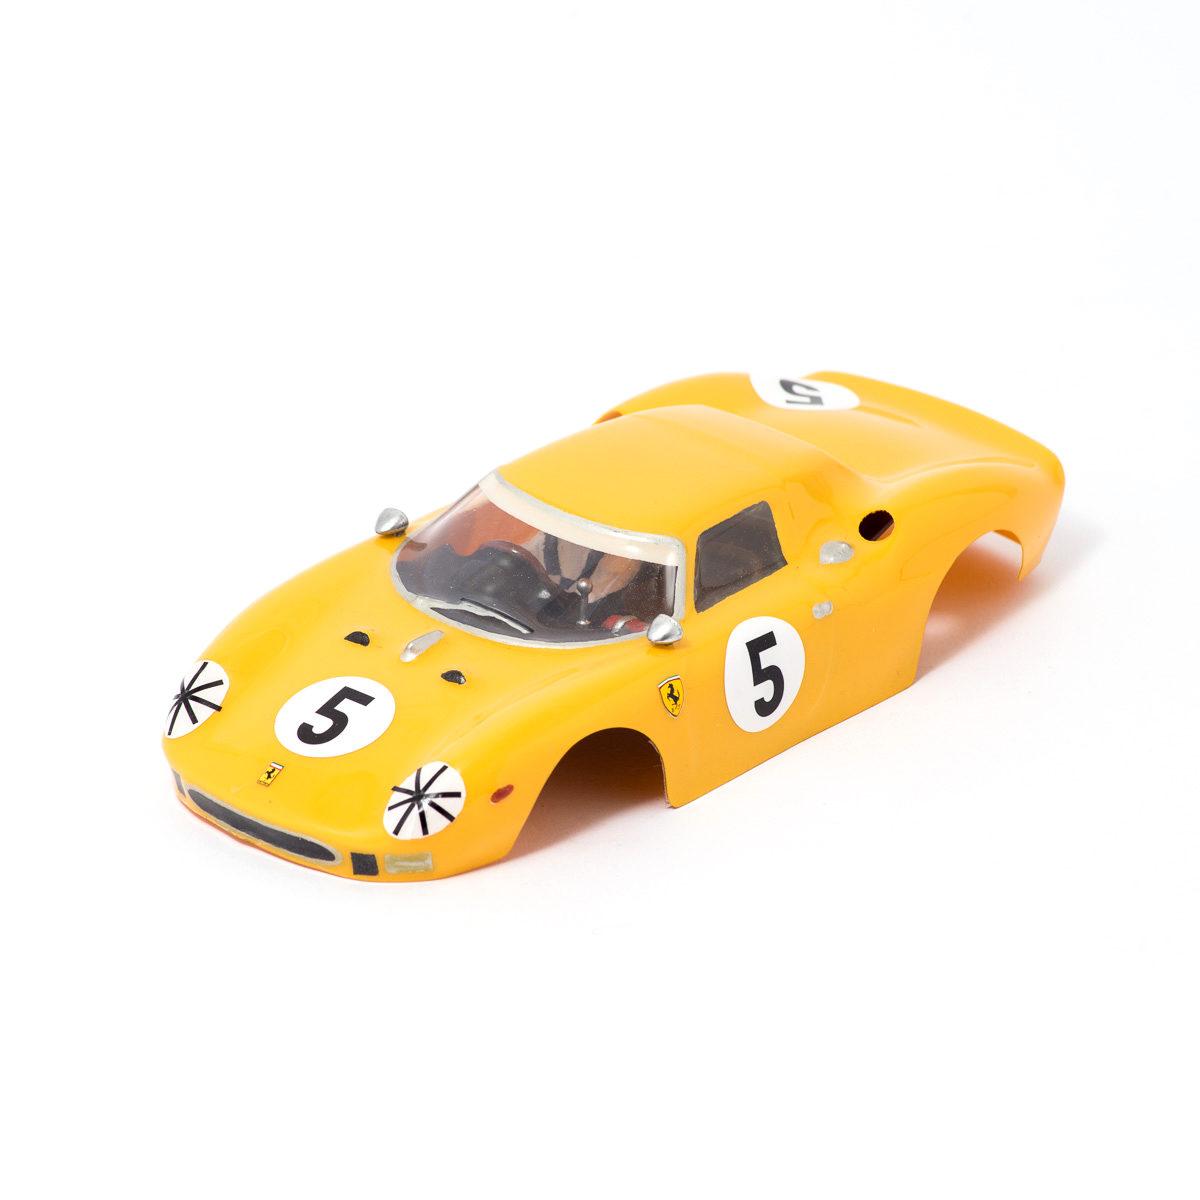 Carrozzeria Slot Car Ferrari 250 LM 1964 1/24 Ecurie